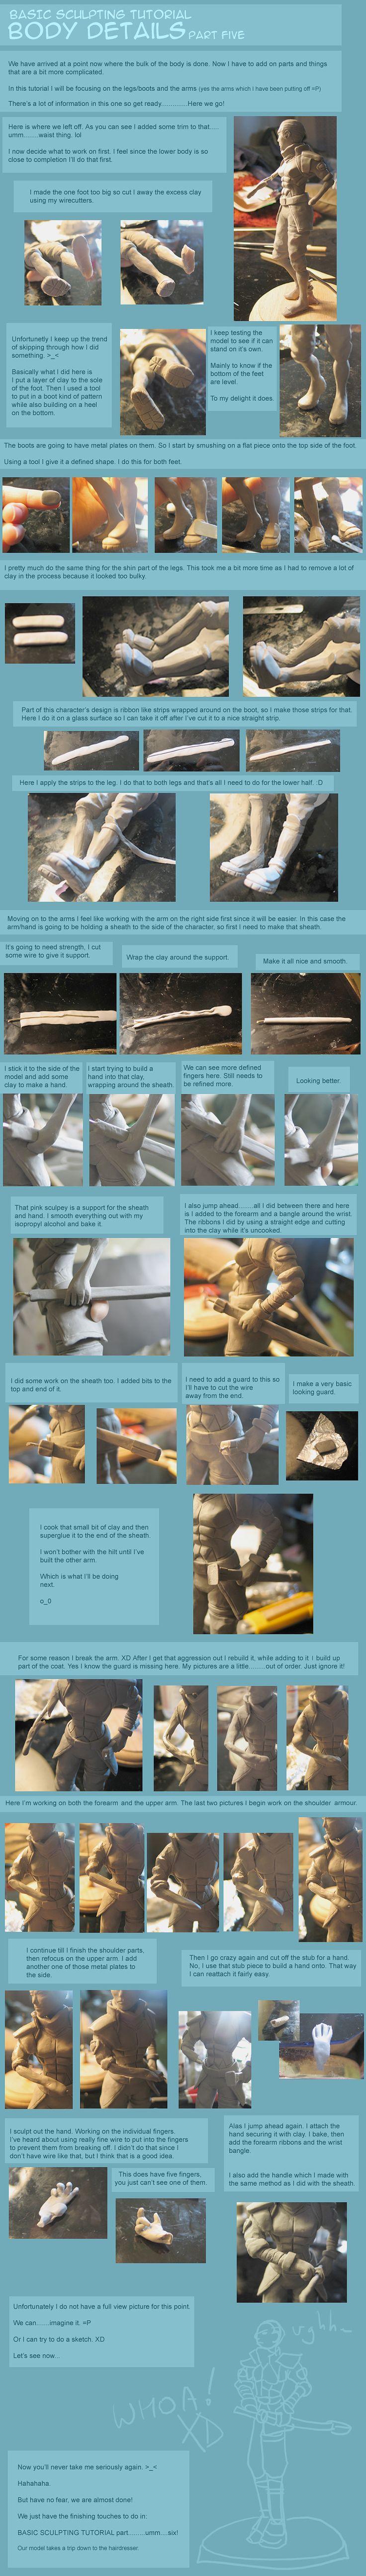 Tutorial 5 - Body Details by =Rennard